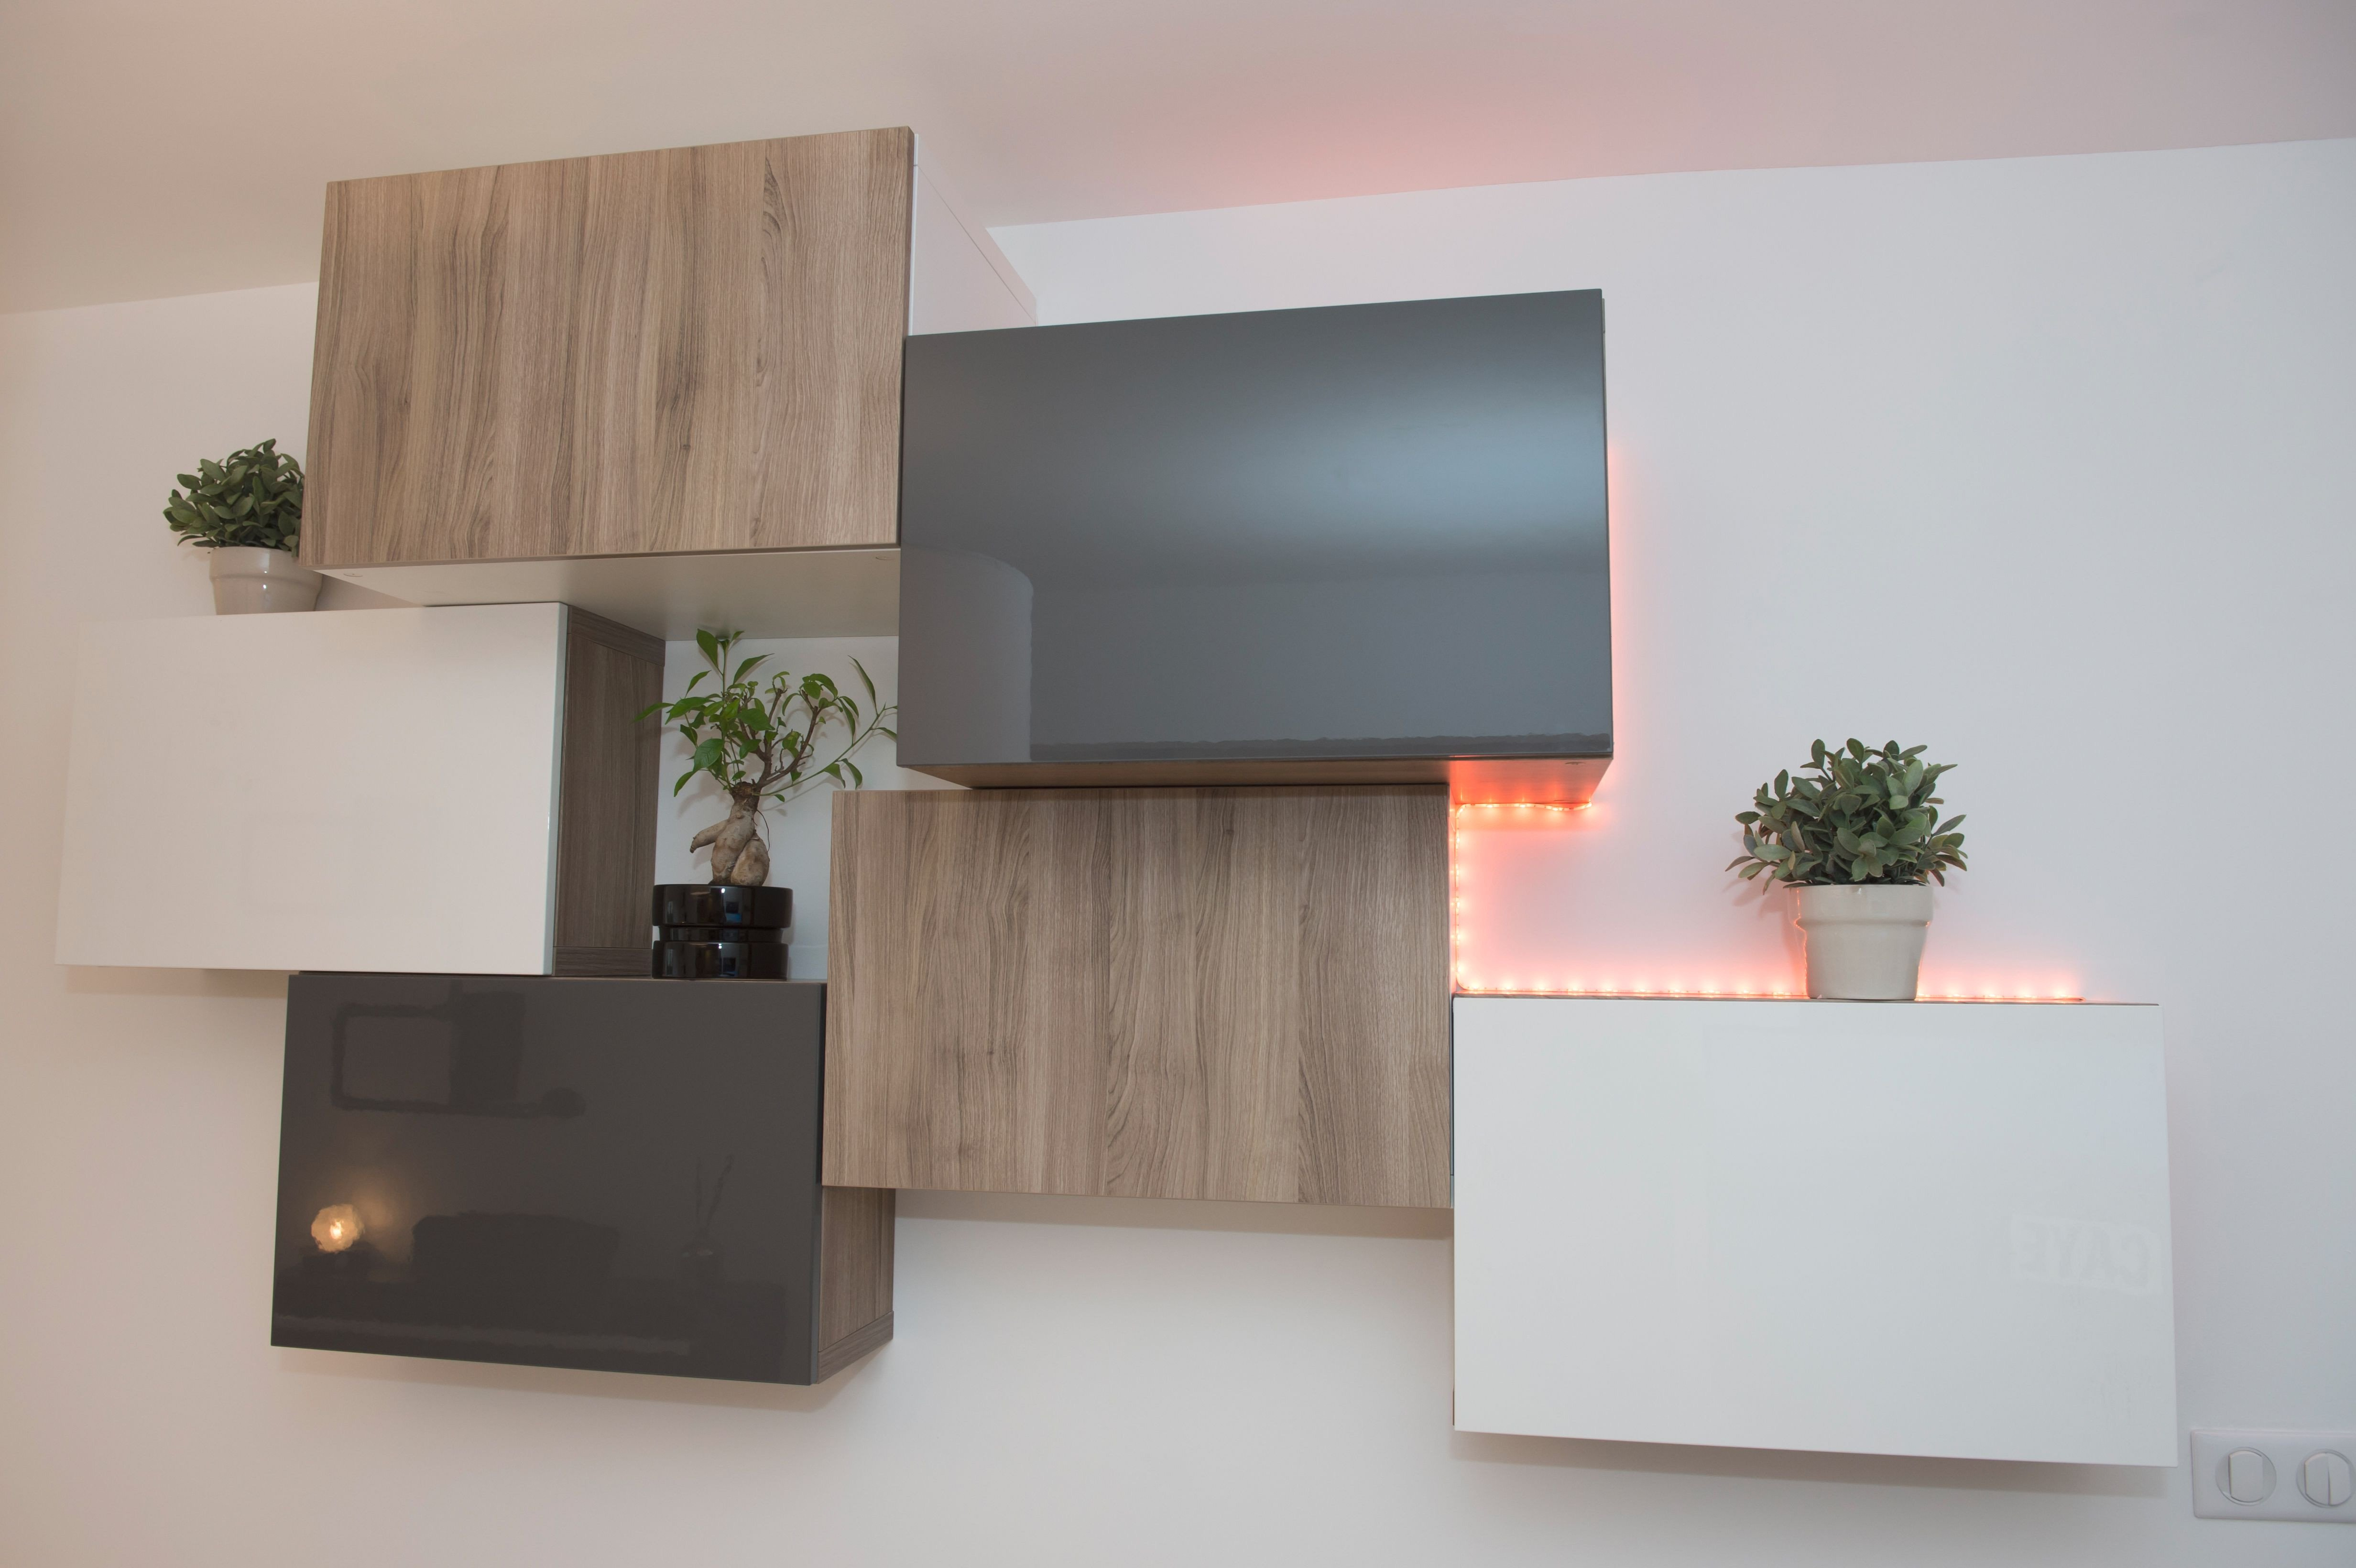 Meuble Tv Placo Design Impressionnant Photos √ Meuble Tv Dangle Charmant Meuble Angle Tv Amazing Meuble Dangle